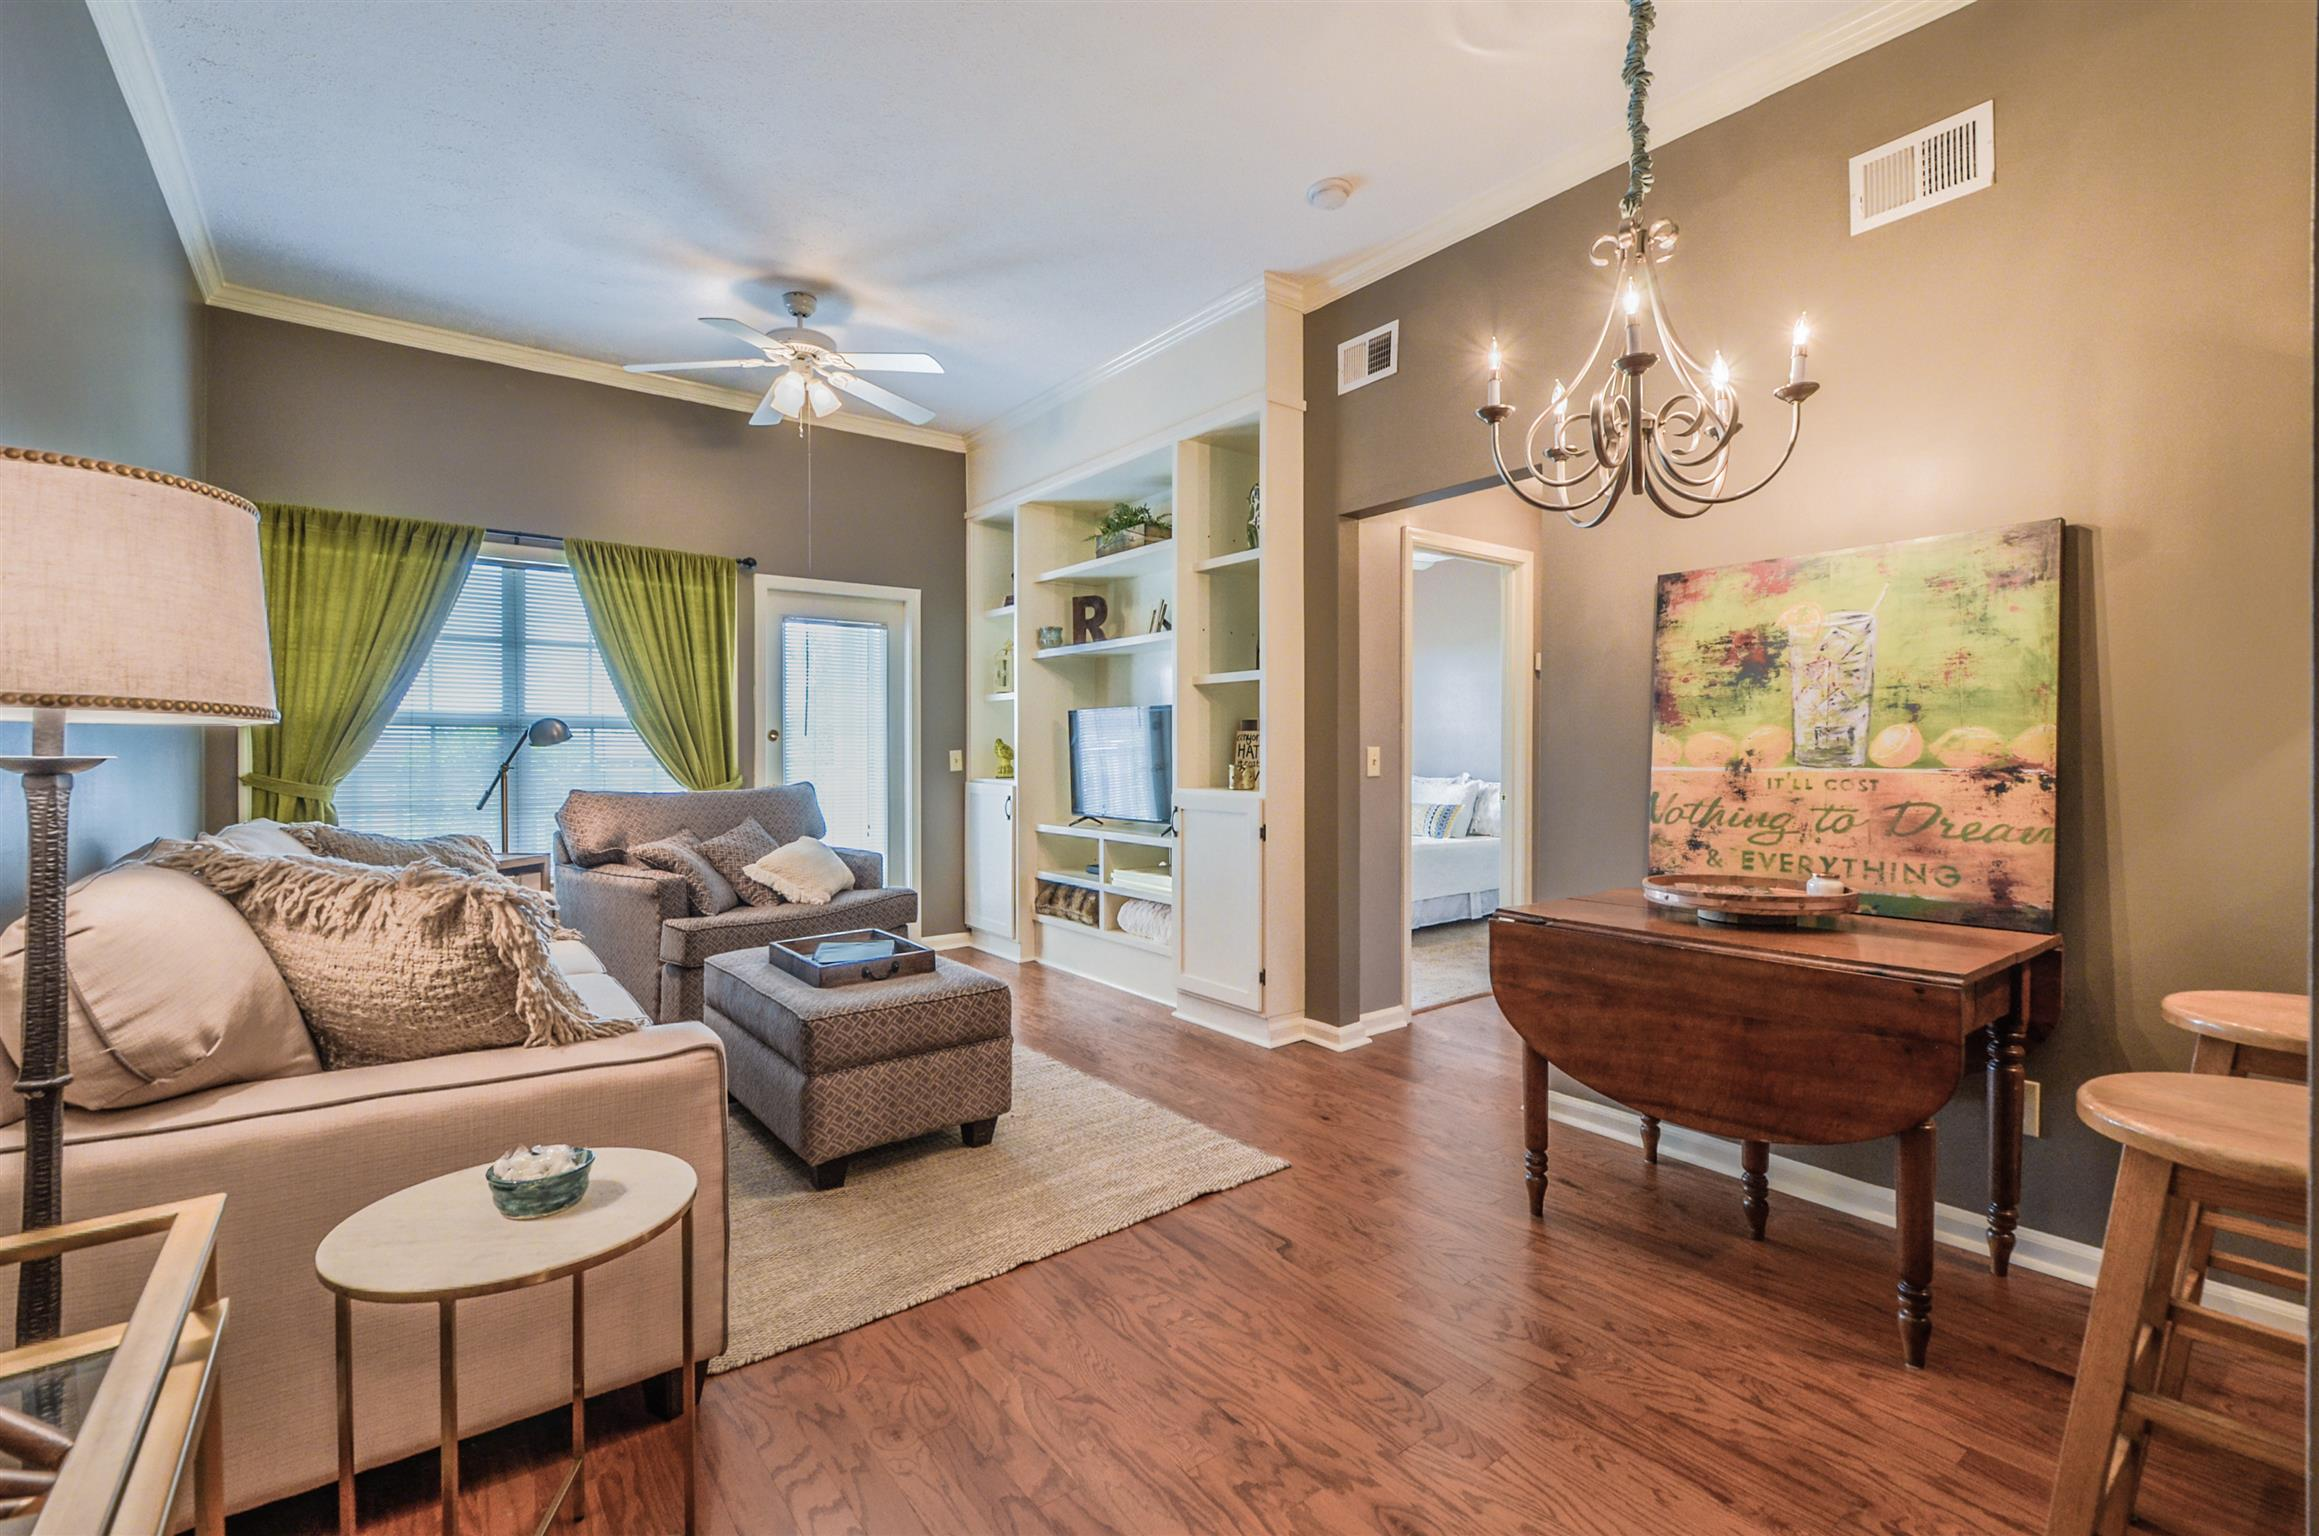 2025 Woodmont Blvd Apt 316, Nashville, TN 37215 - Nashville, TN real estate listing